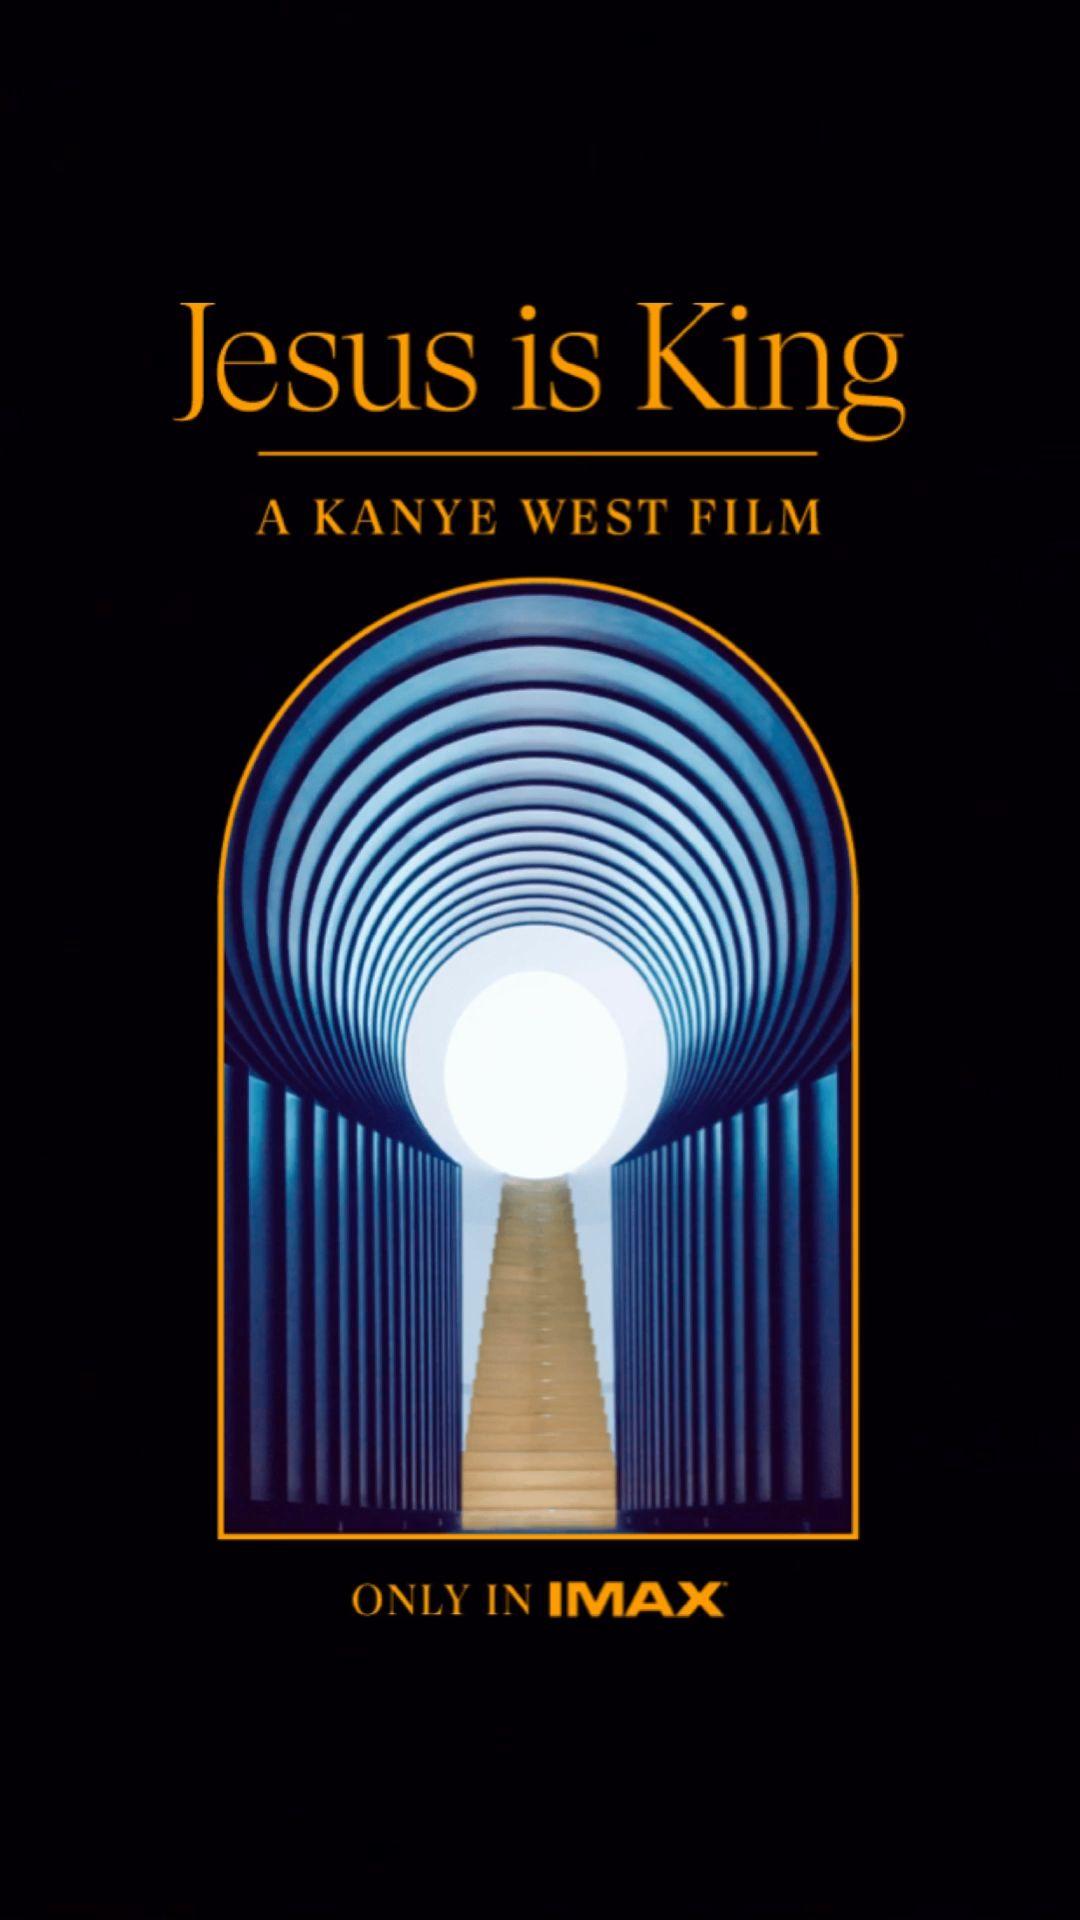 J E S U S I S K I N G Video Kanye West Wallpaper Iphone Wallpaper Kanye Iphone Wallpaper Video